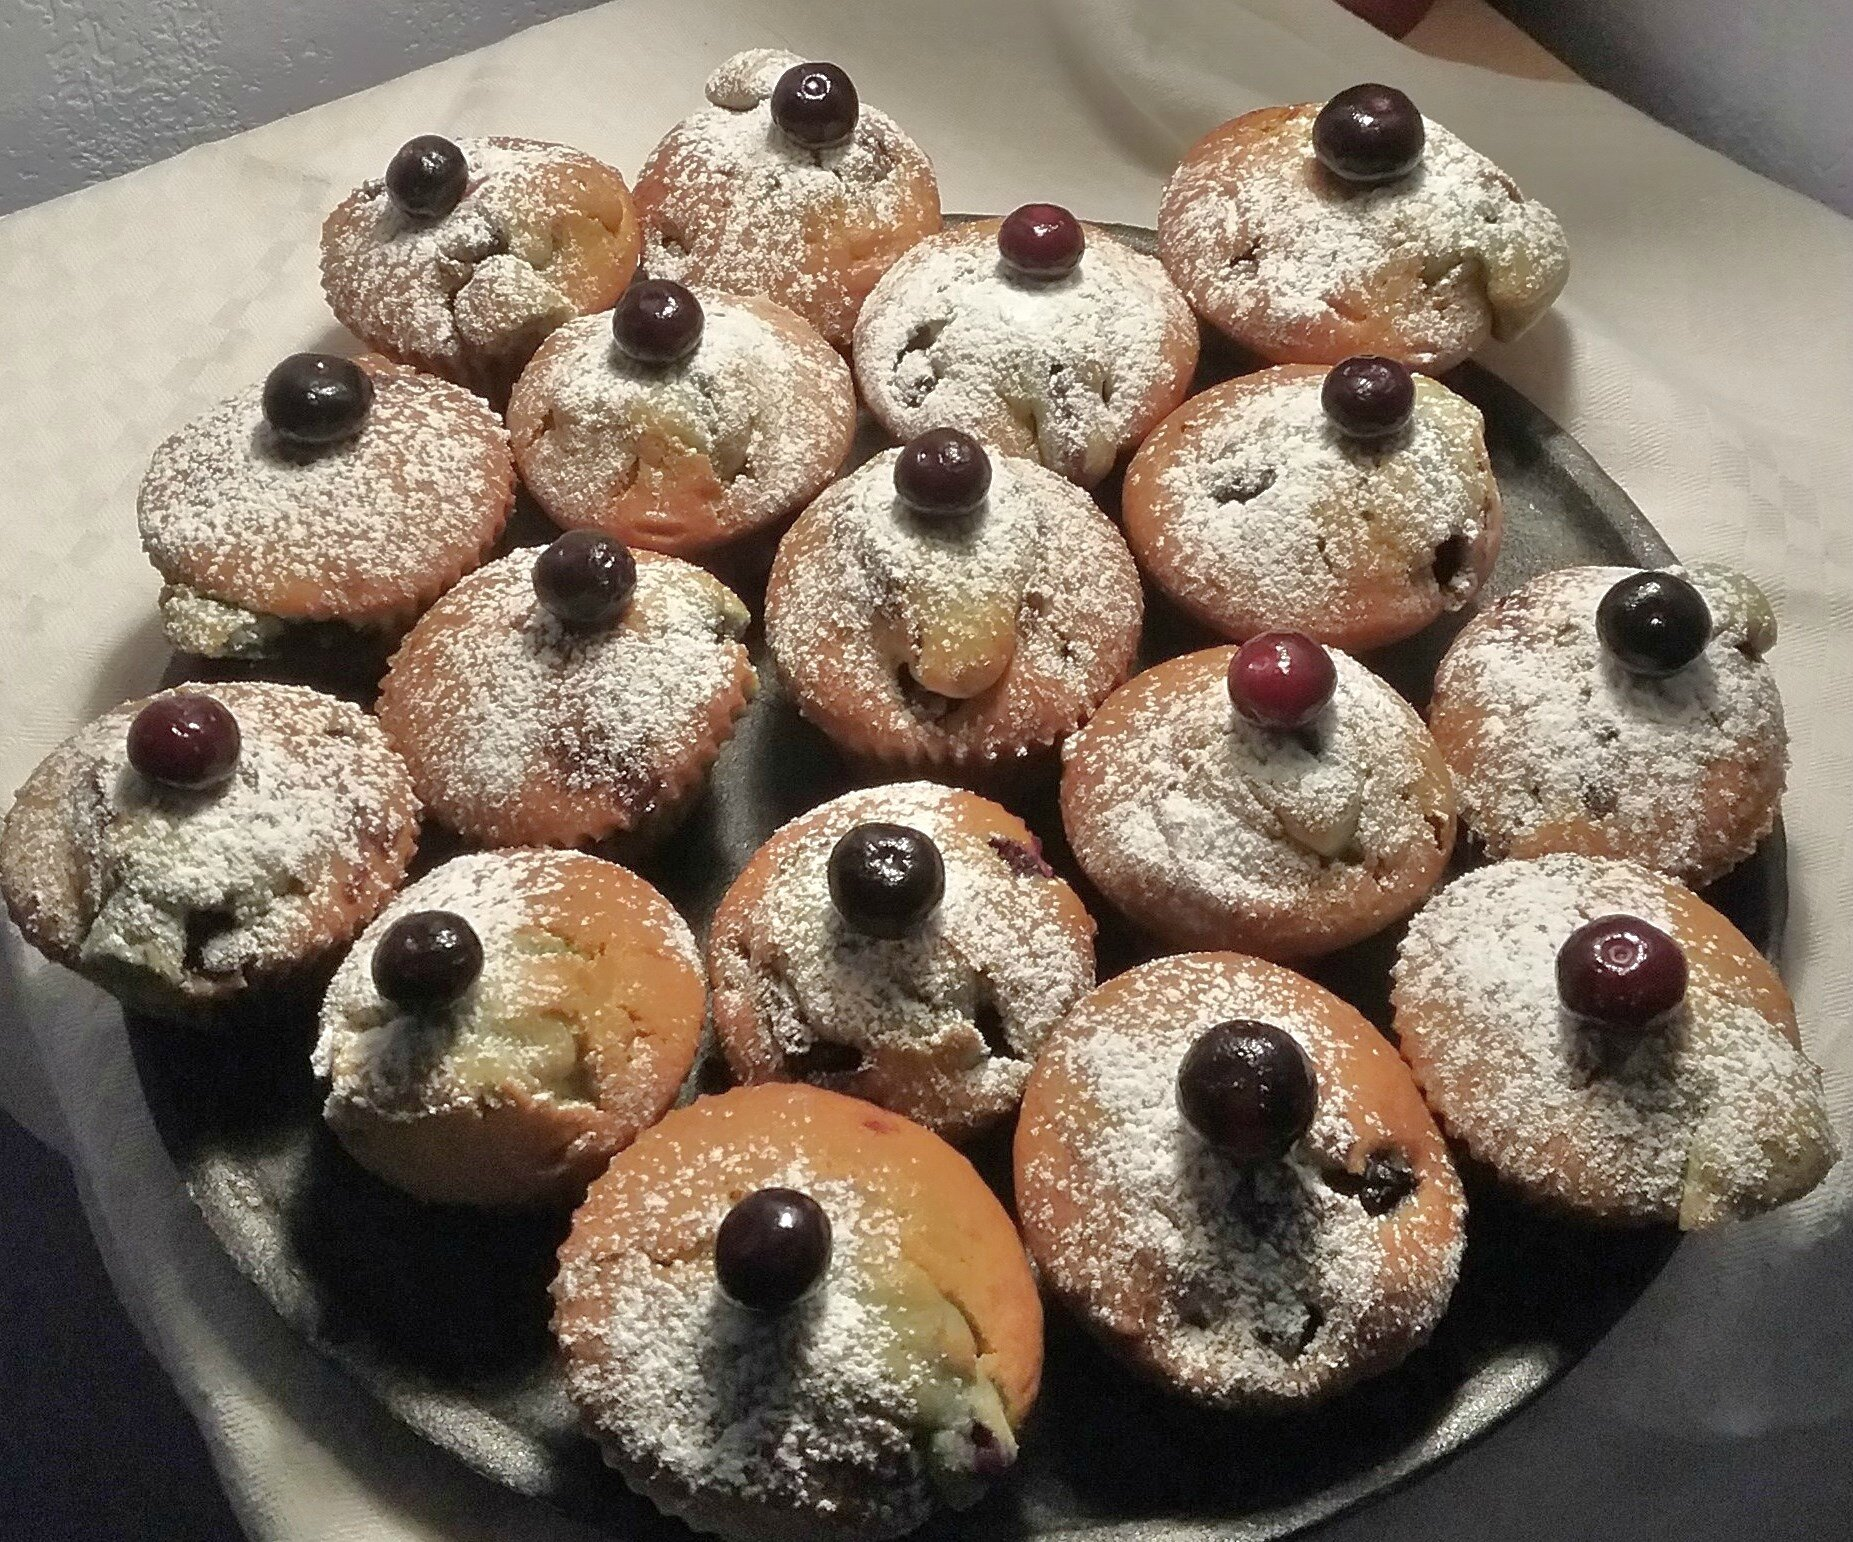 Muffins aux myrtilles - Blueberry muffins